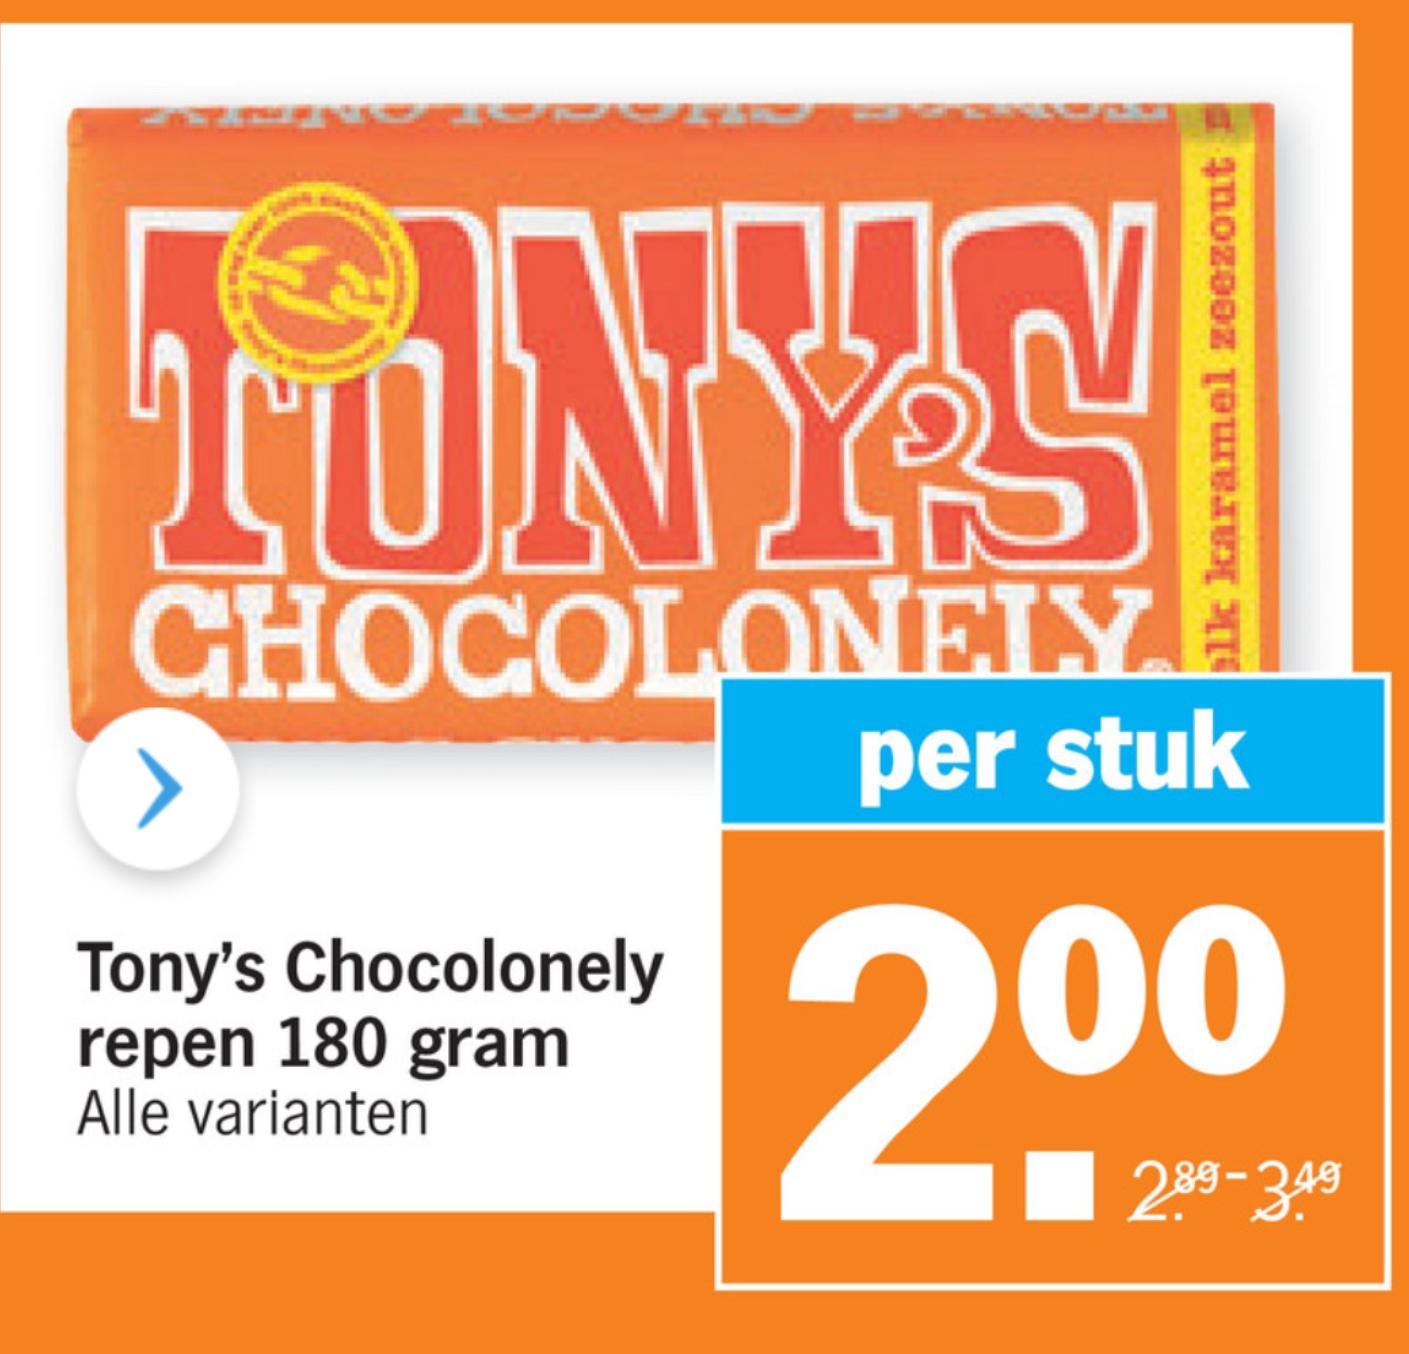 Tony Chocolonely 2 Euro per stuk